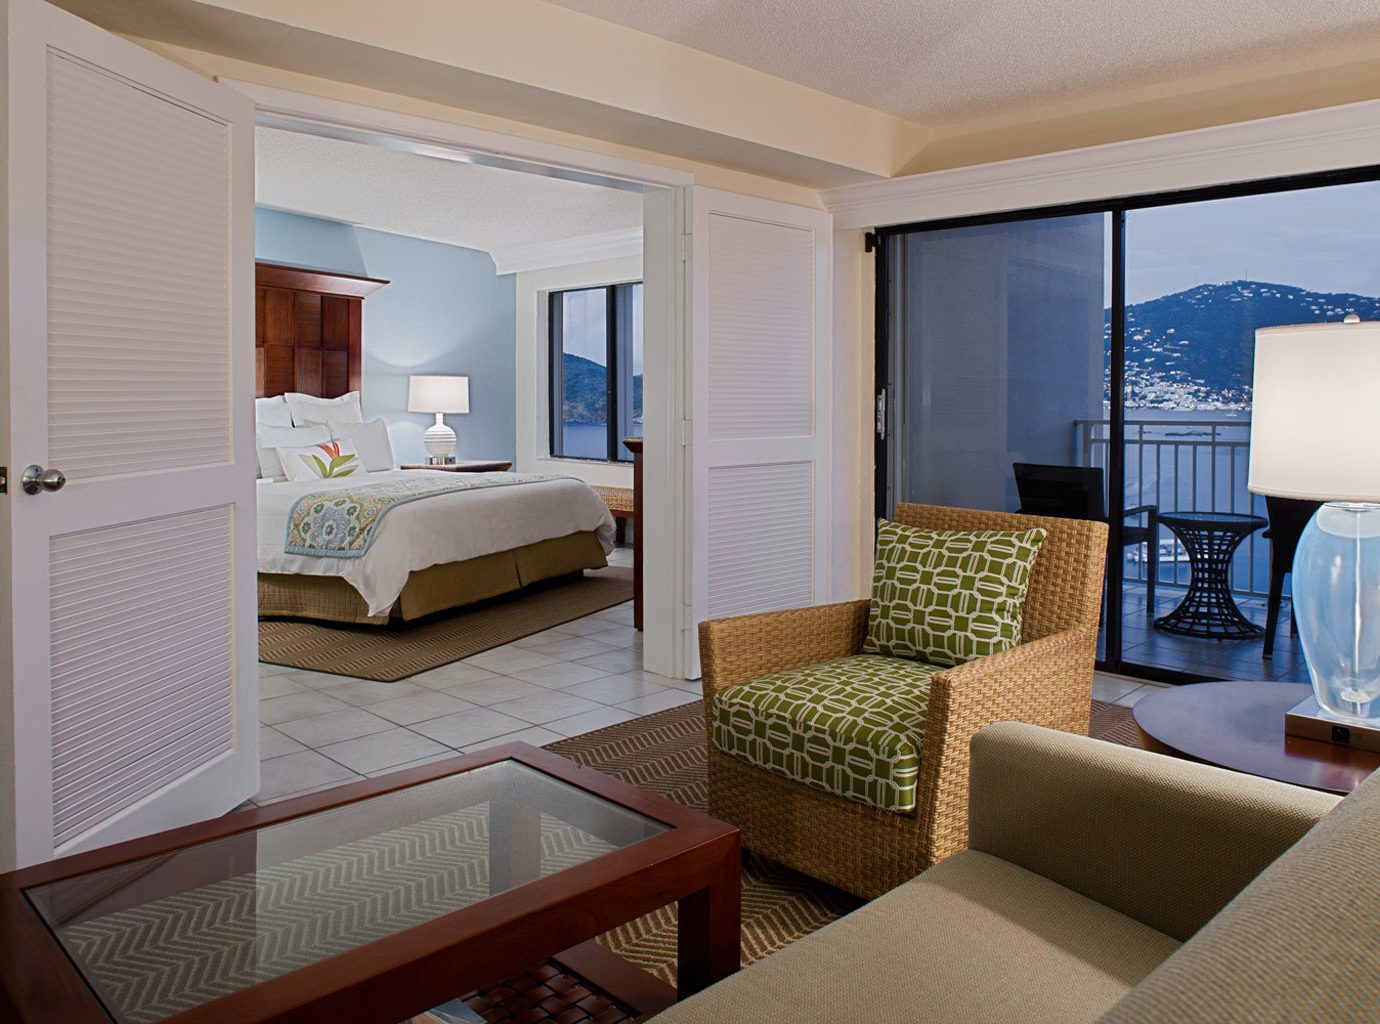 Balcony Bedroom Resort Suite property condominium living room home cottage